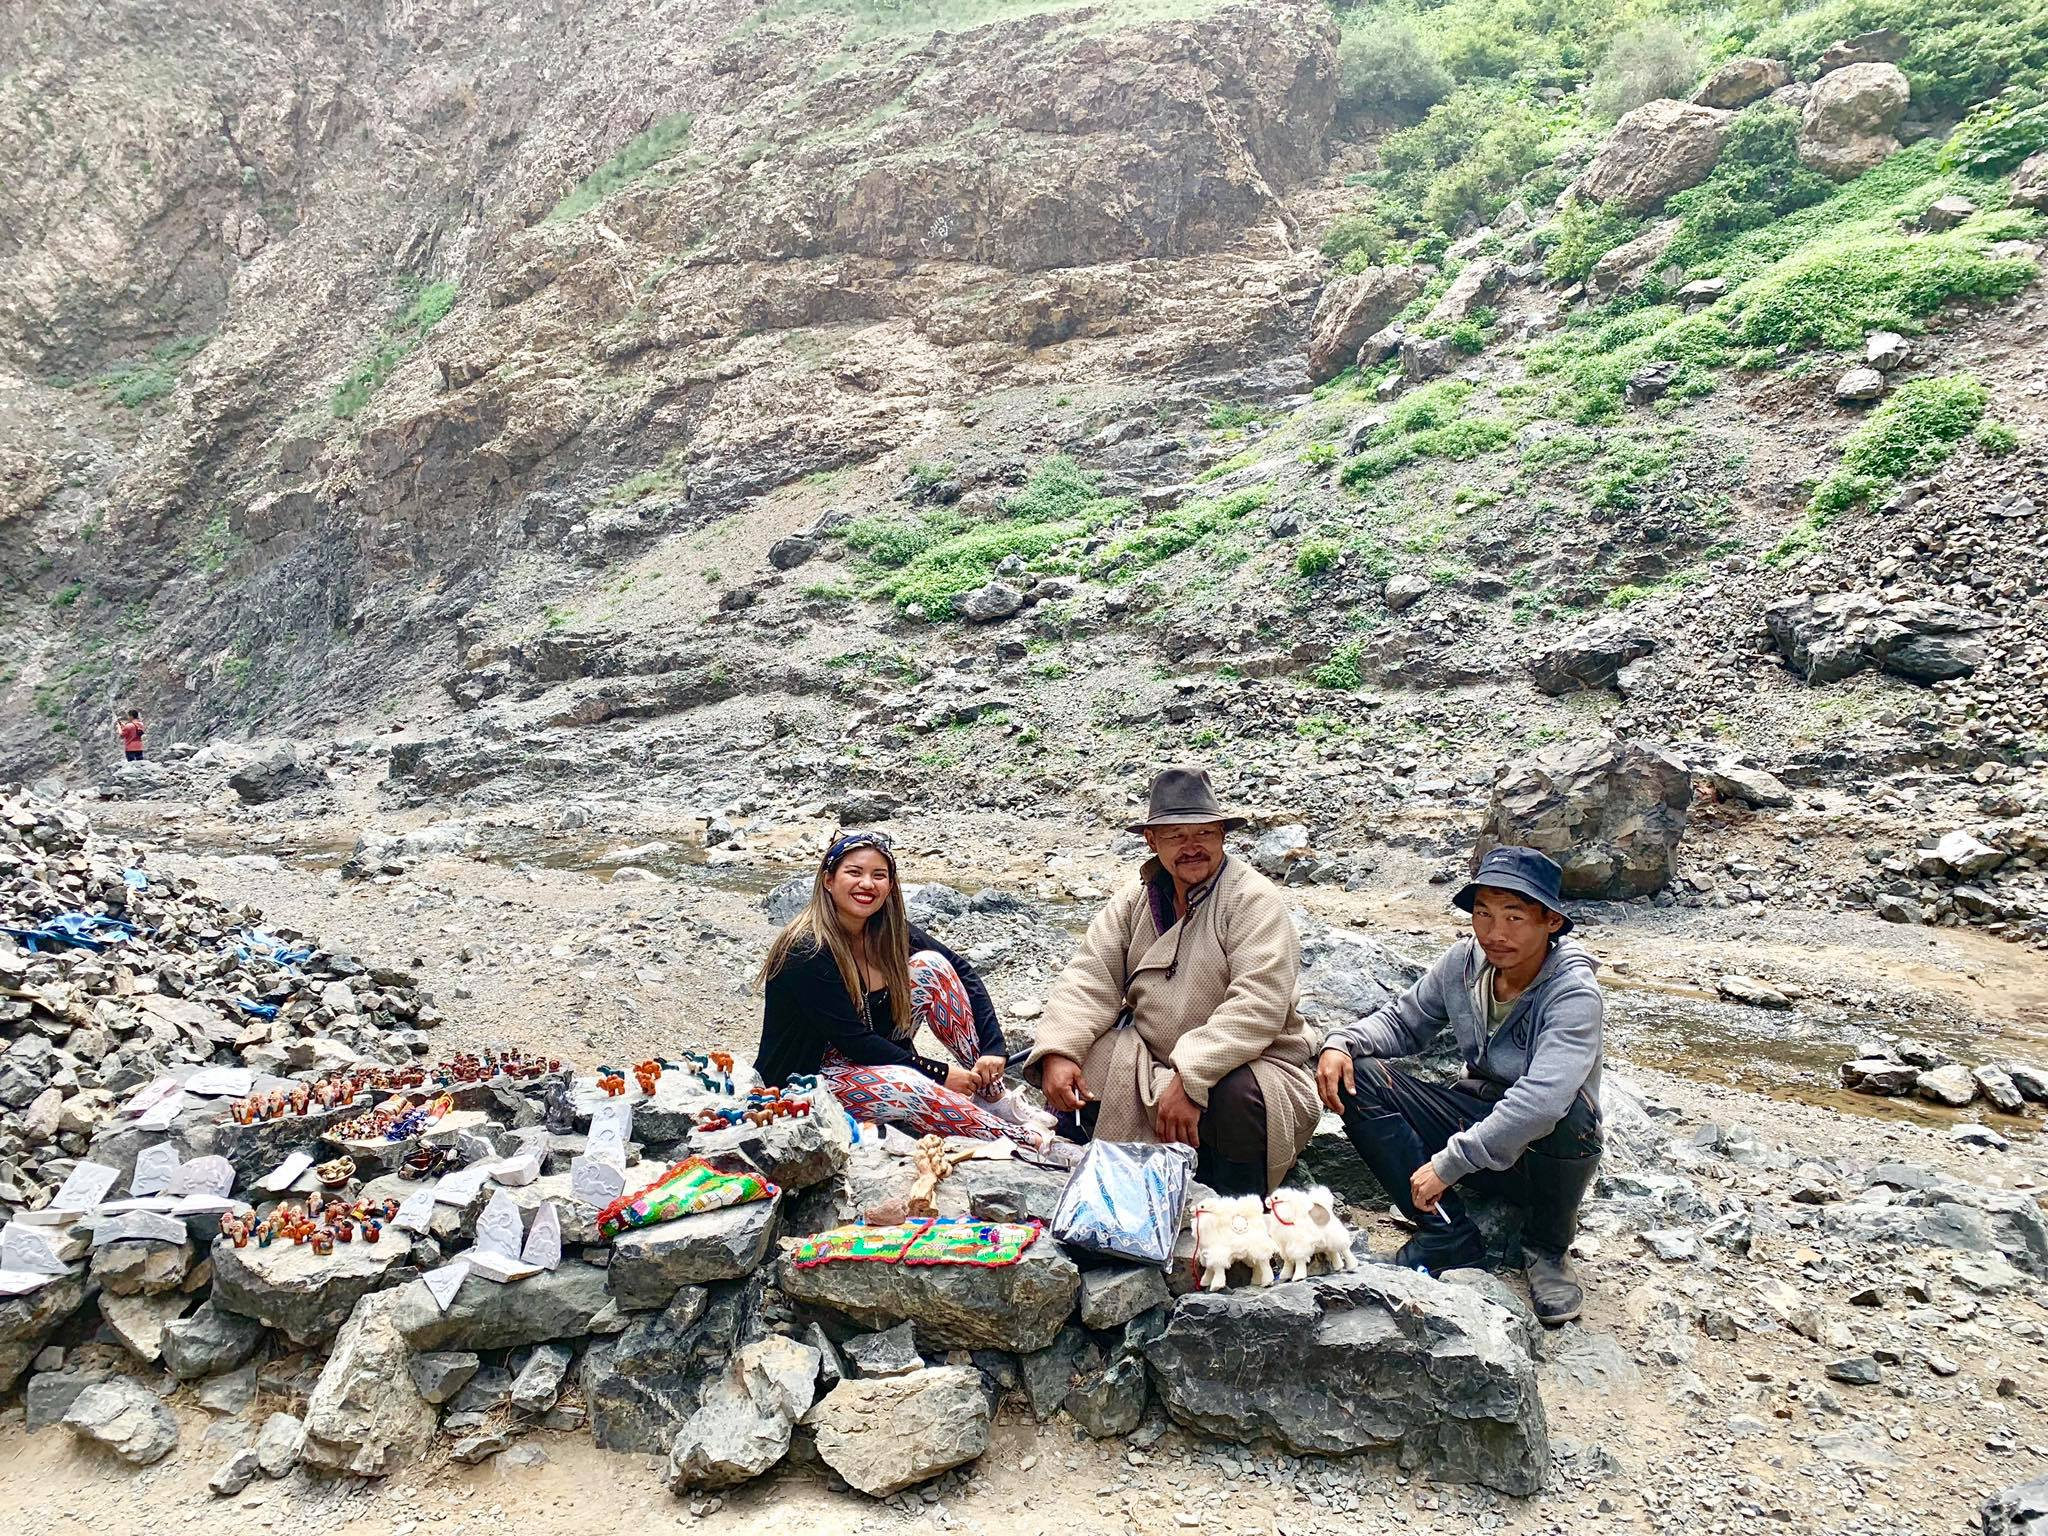 Kach Solo Travels in 2019 Horseback riding trip to the Gobi Gurvan Saikhan National Park24.jpg